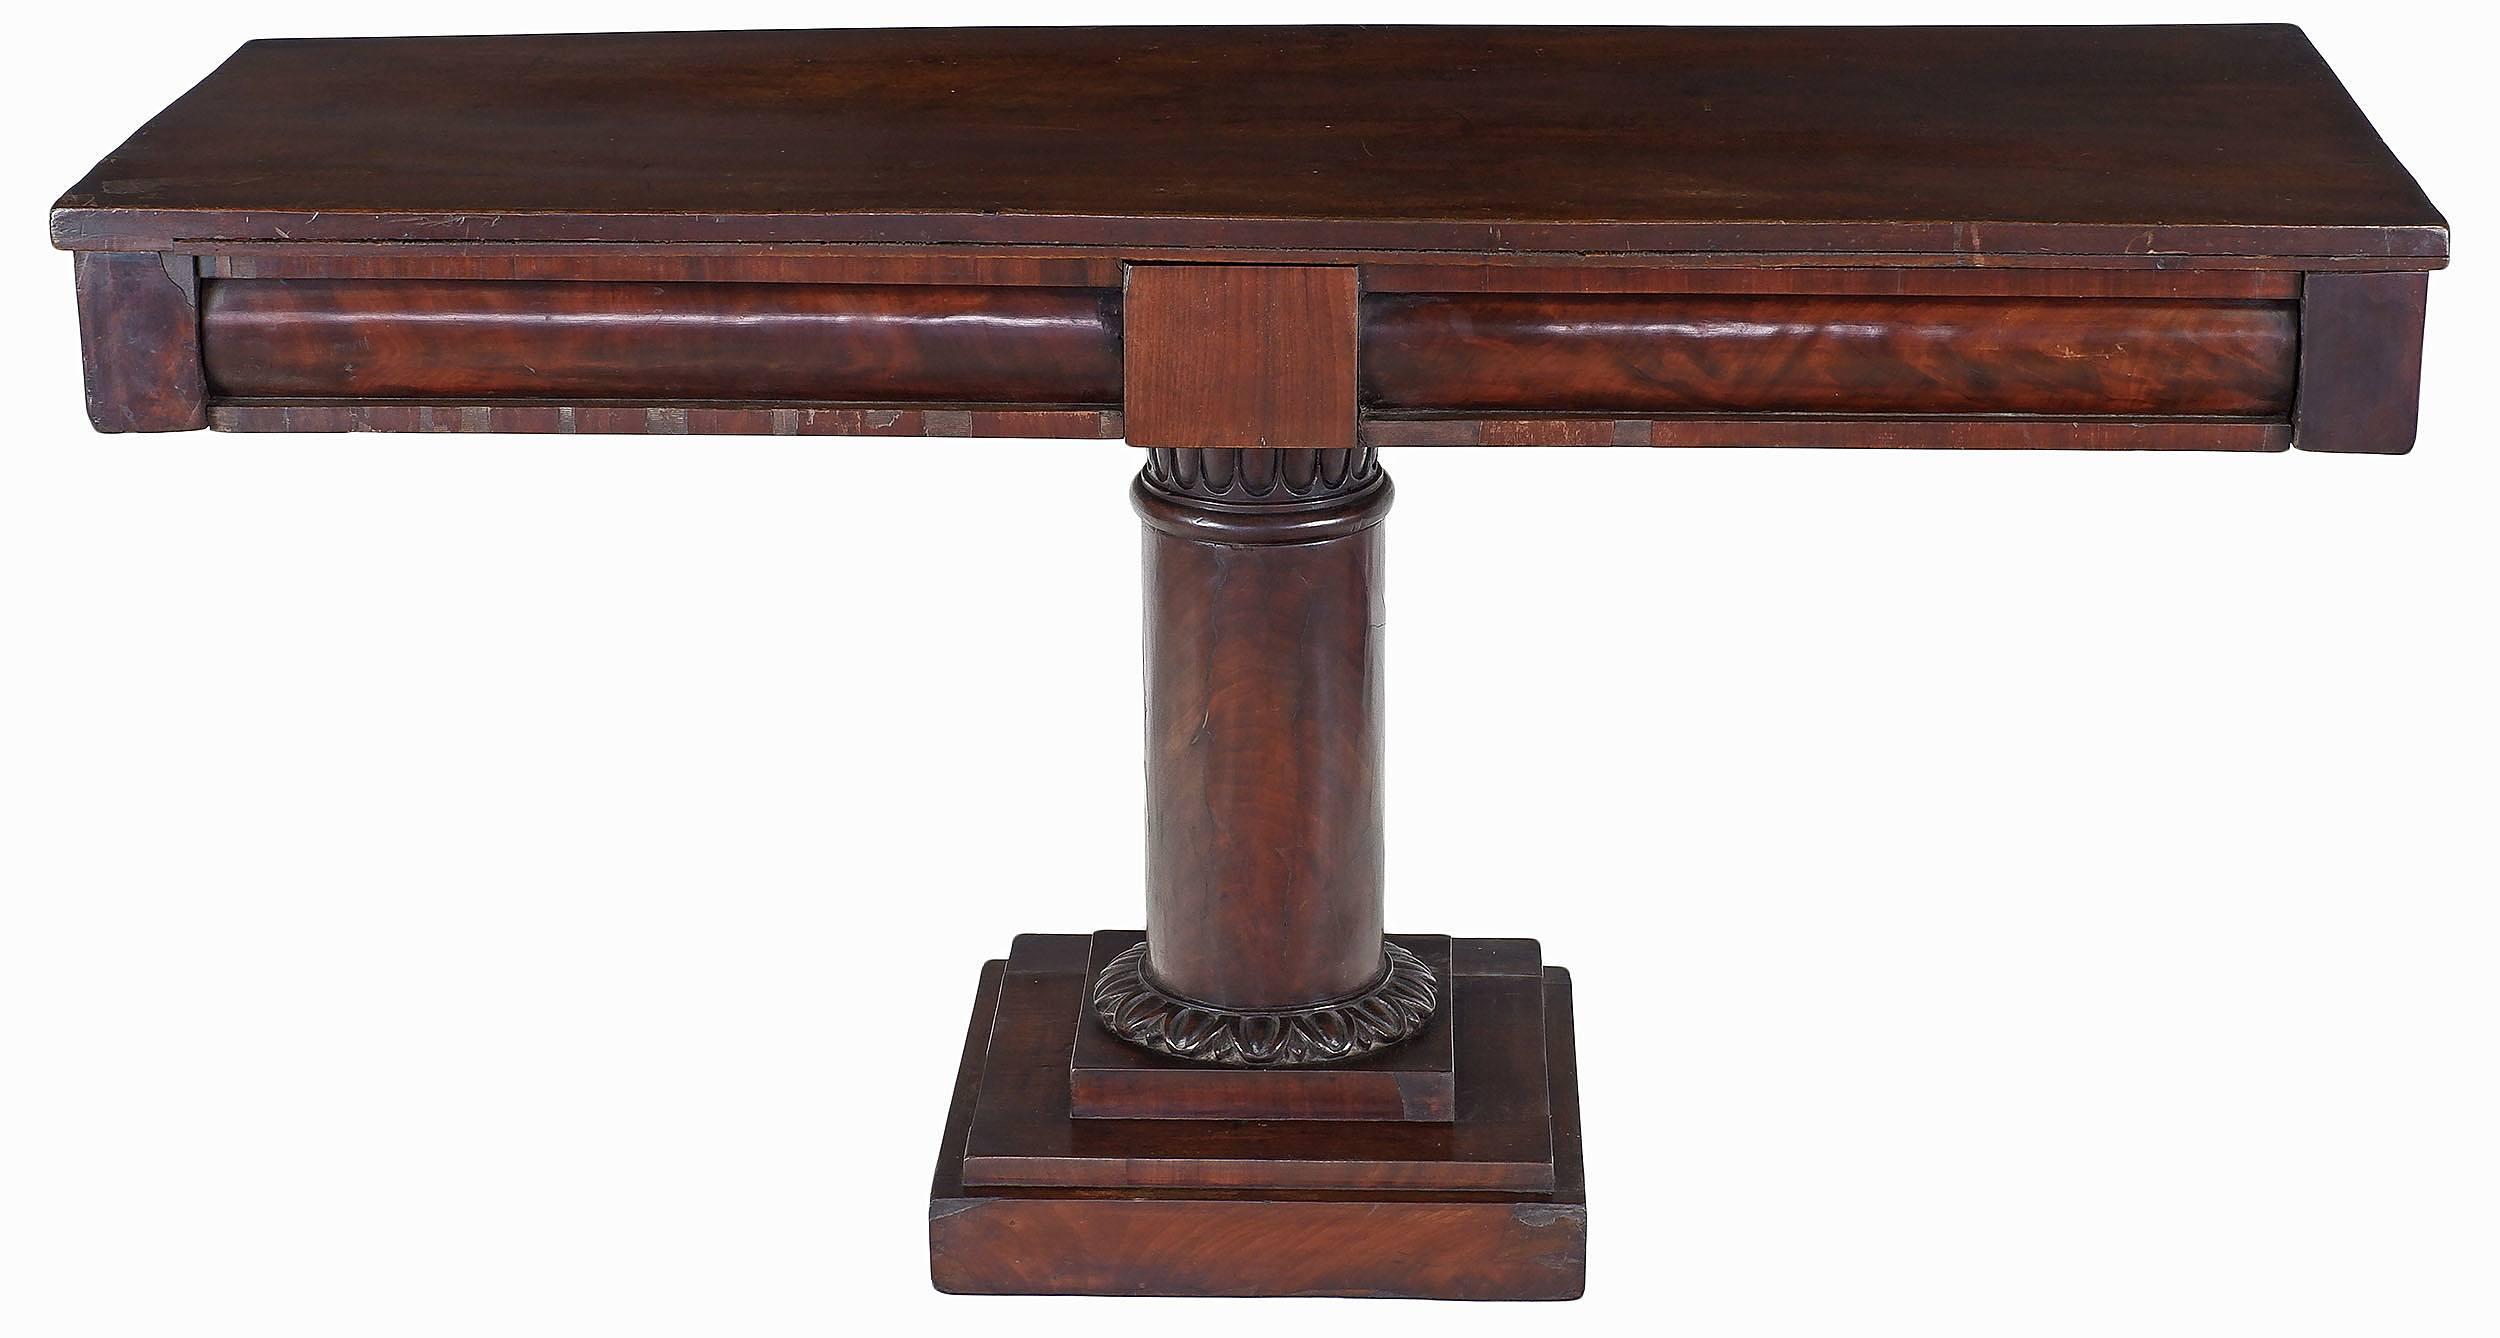 'Rare Large Australian Cedar Architectural Style Console Table Circa 1840'